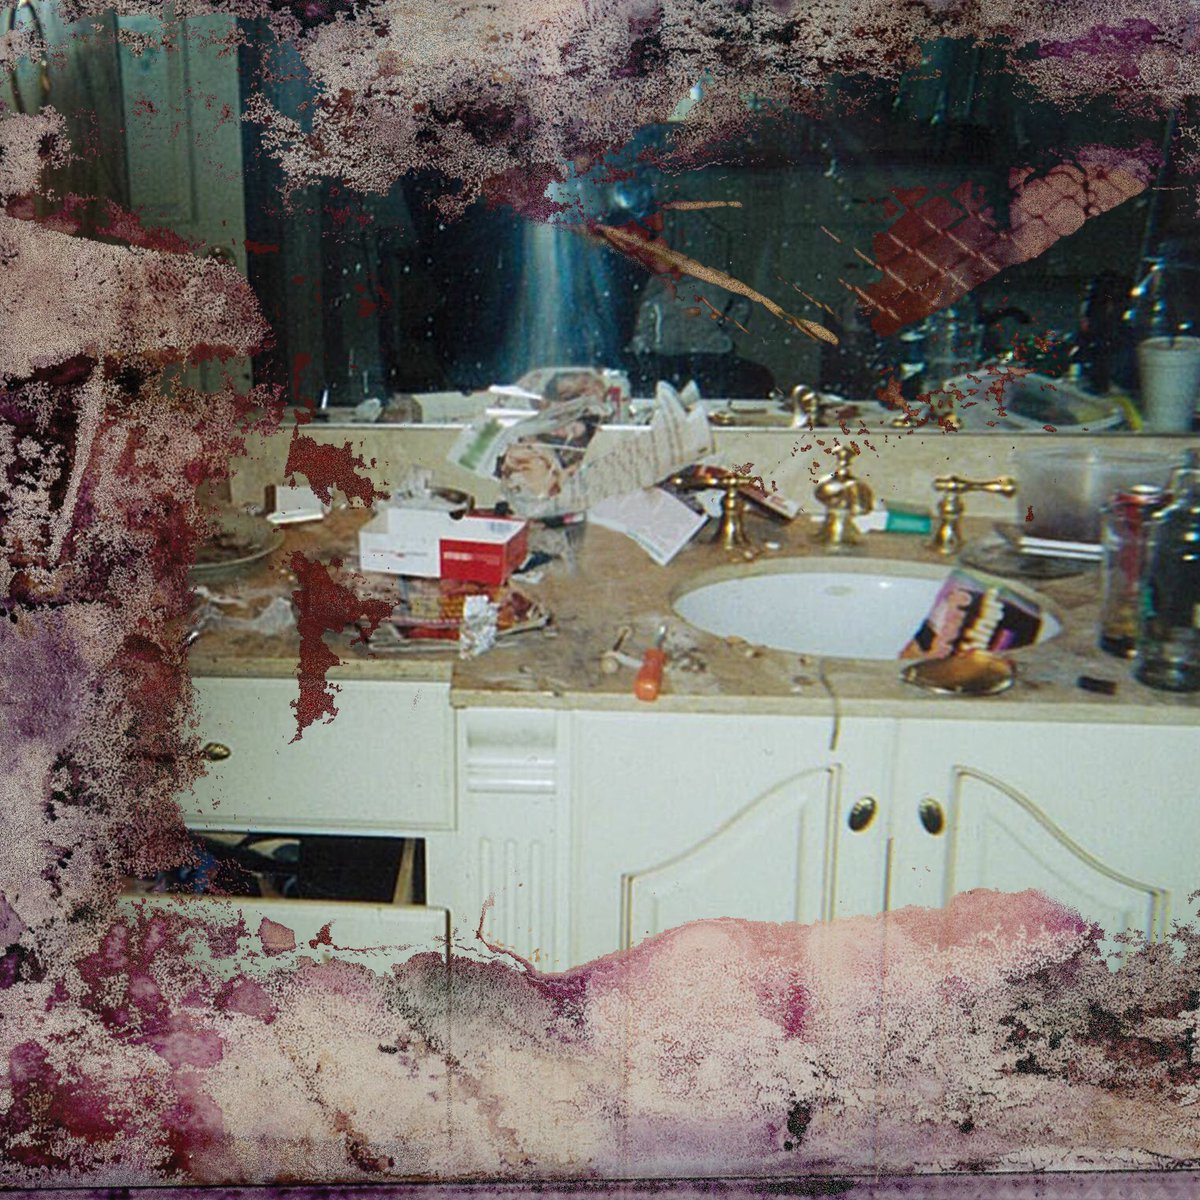 'Daytona' album cover